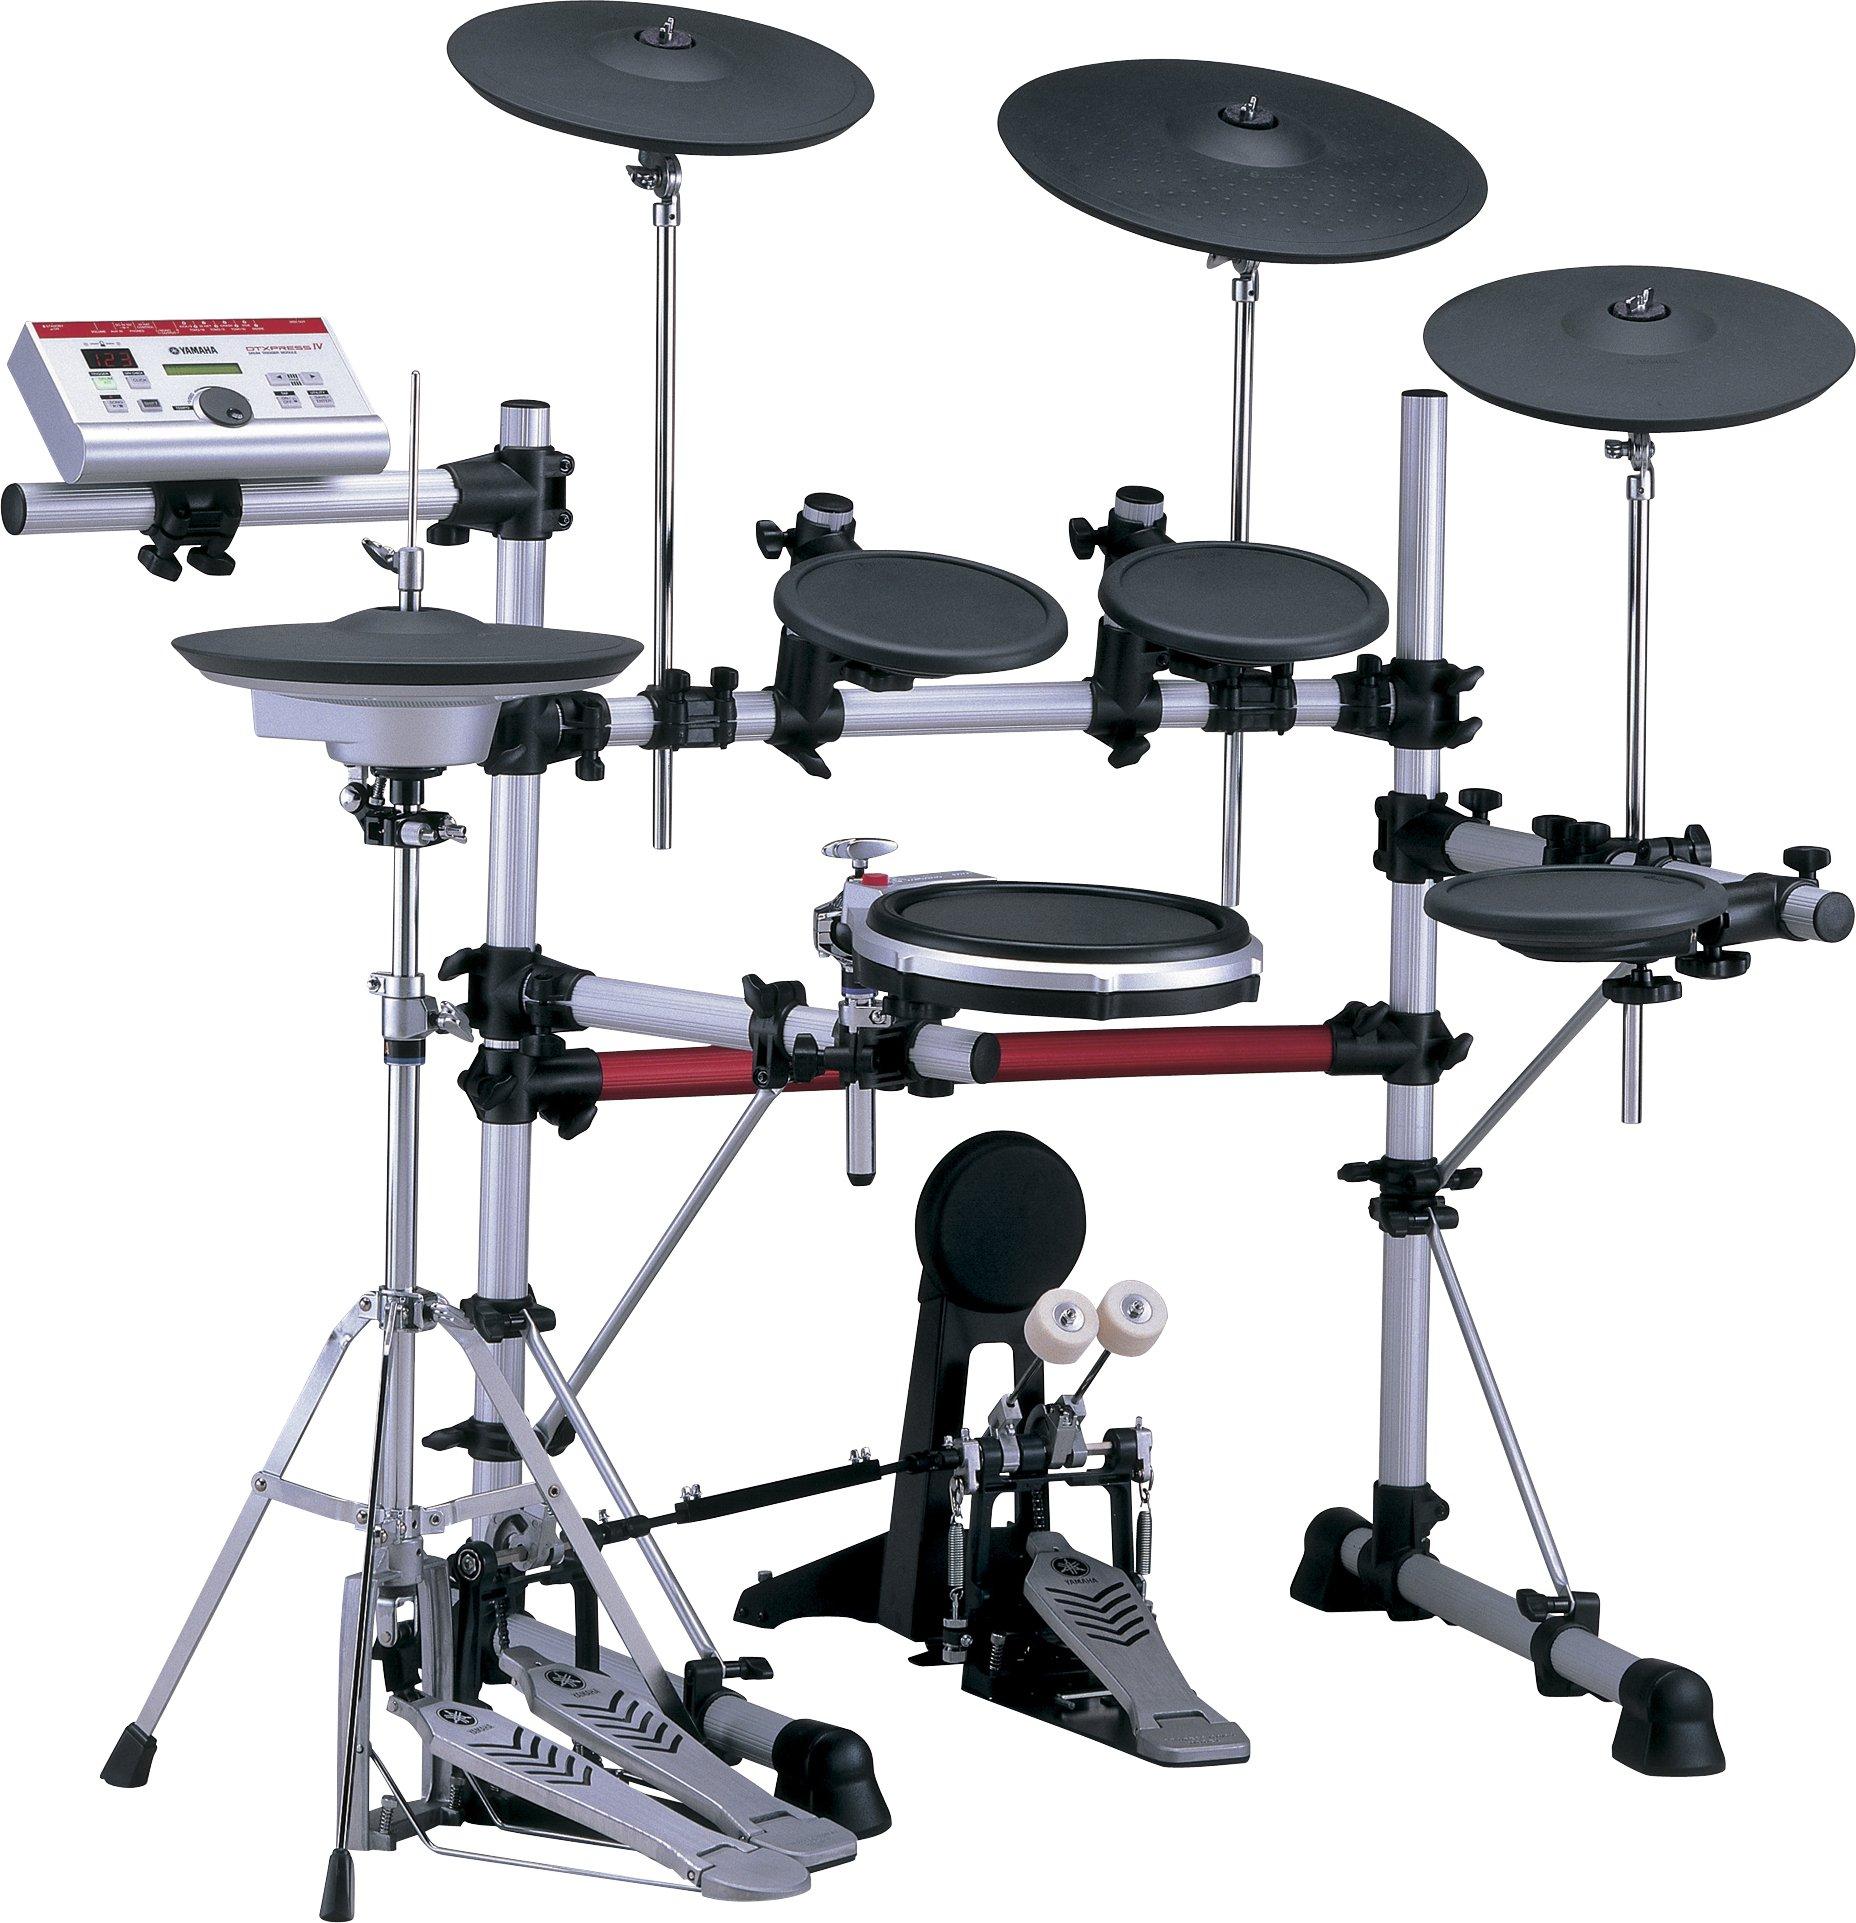 Electric Drum Sets - Acoustic Drum - Drums & Percussion - Products